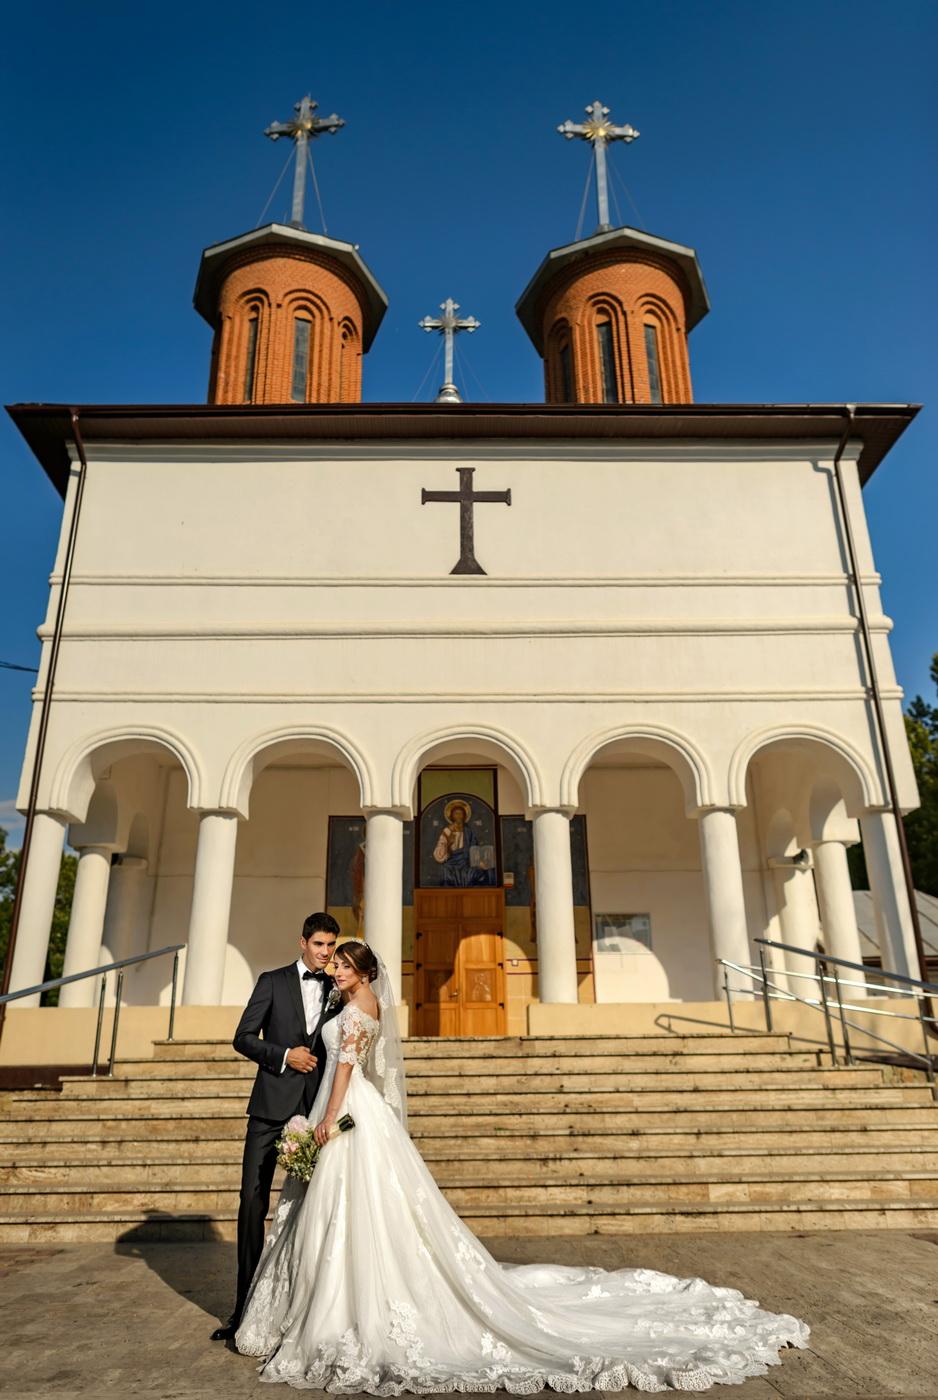 Destination Wedding Photographer_Marian Sterea_054.jpg